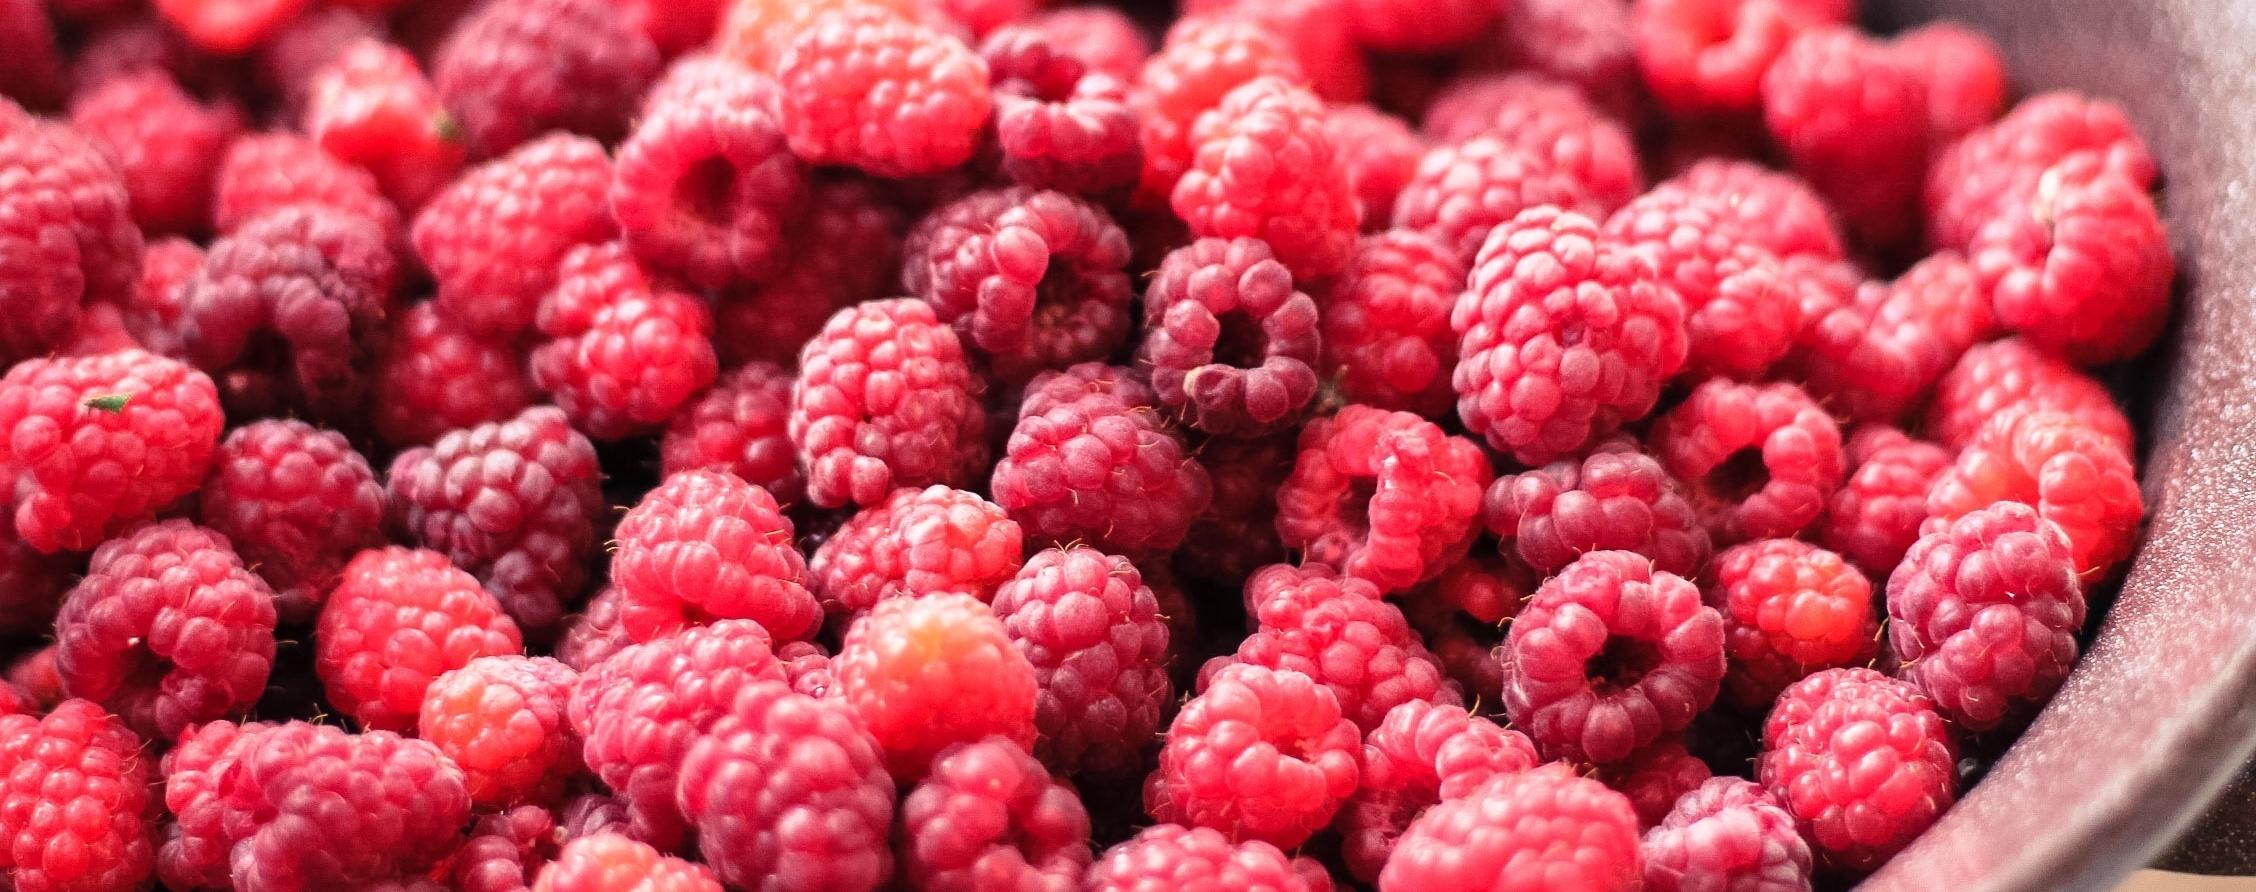 Bowl of Rasberries_Veronica Sulinska_StockSnap.io Photo.jpg